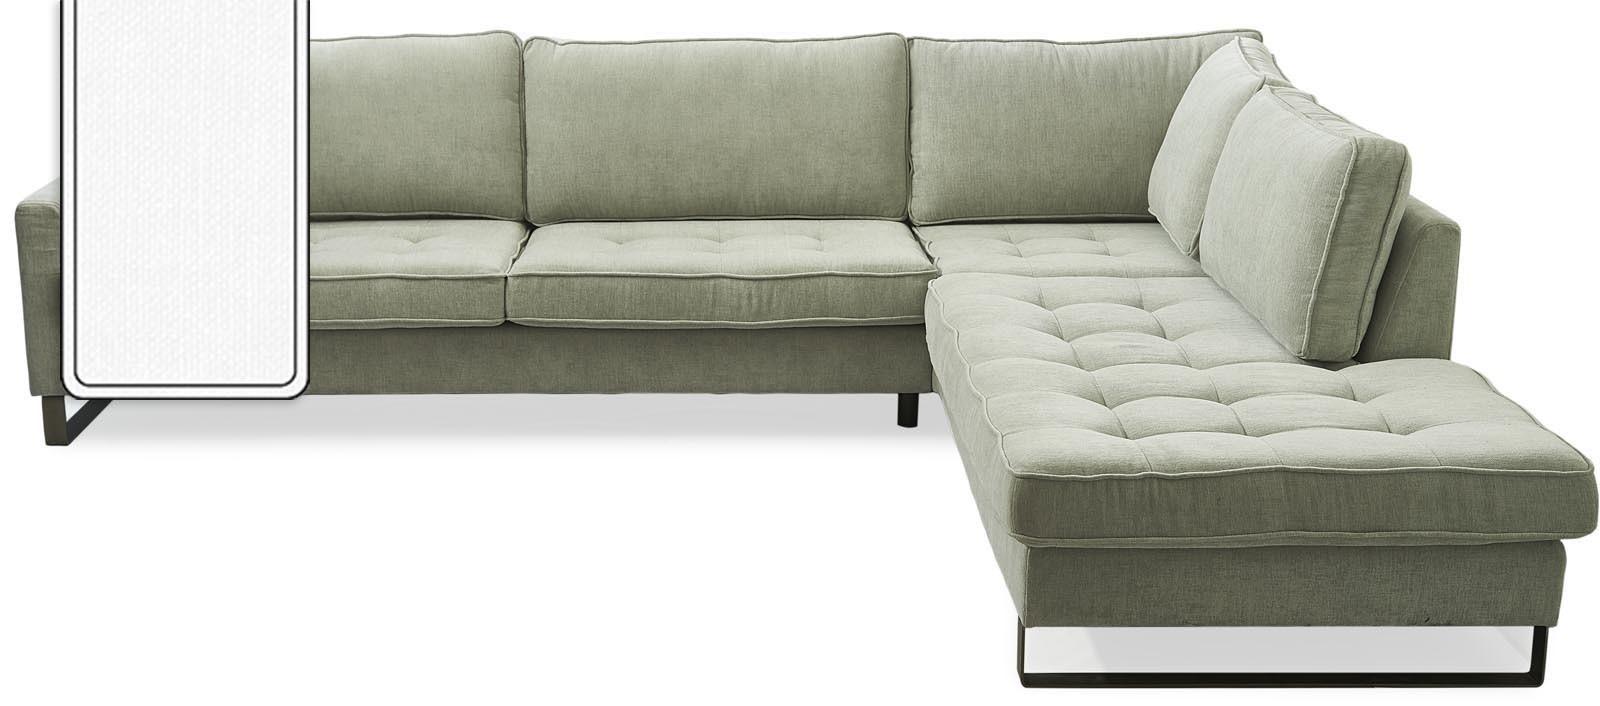 West Houston Corner Sofa Chaise Longue Right Cotton White / Rivièra Maison